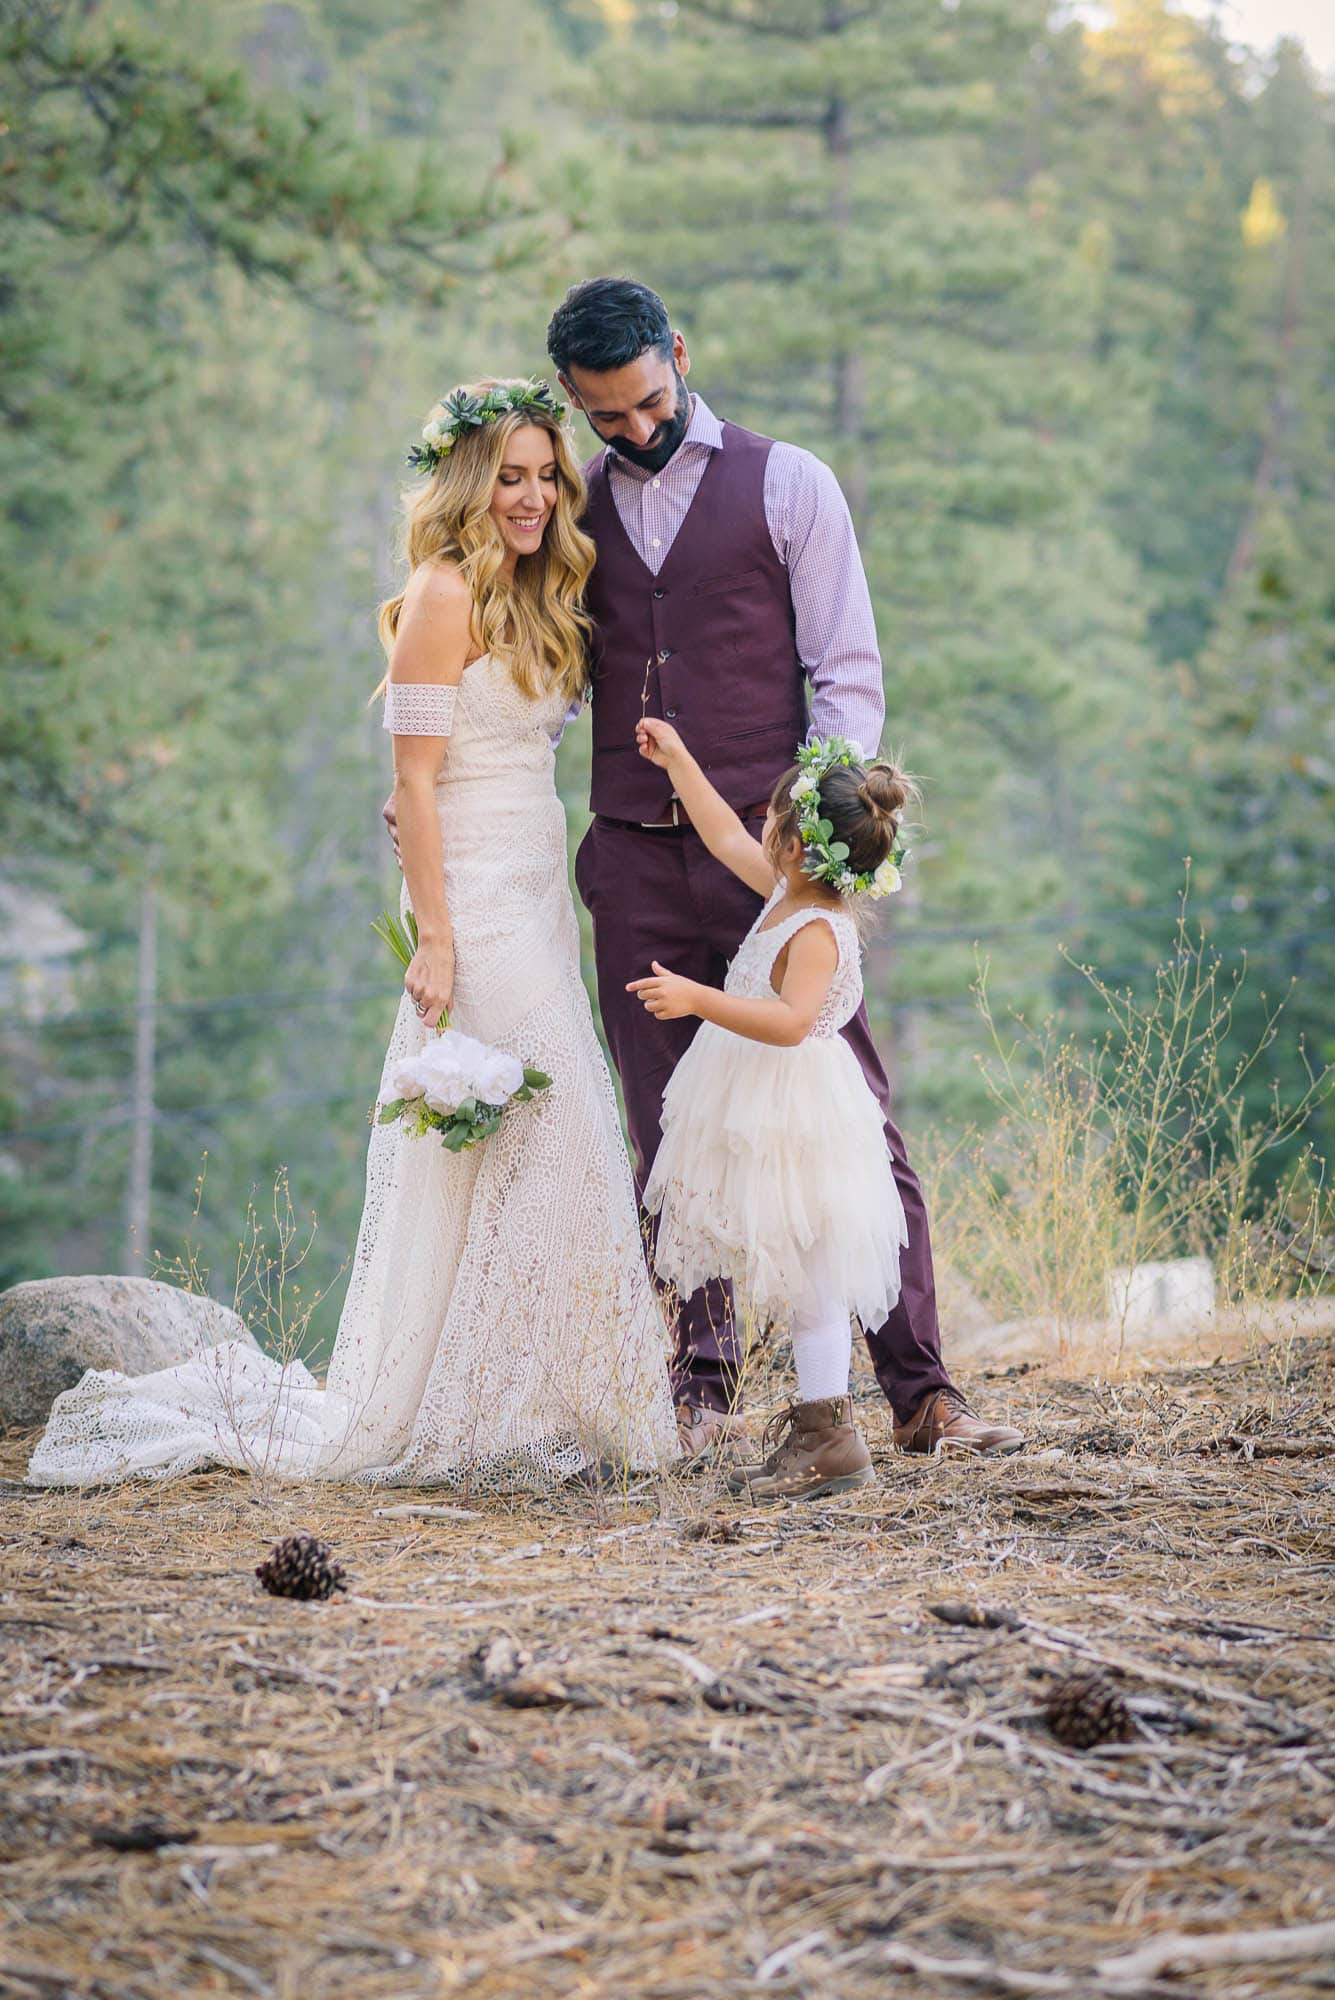 033_Alan_and_Heidi_Wedding_Natalie_Mike